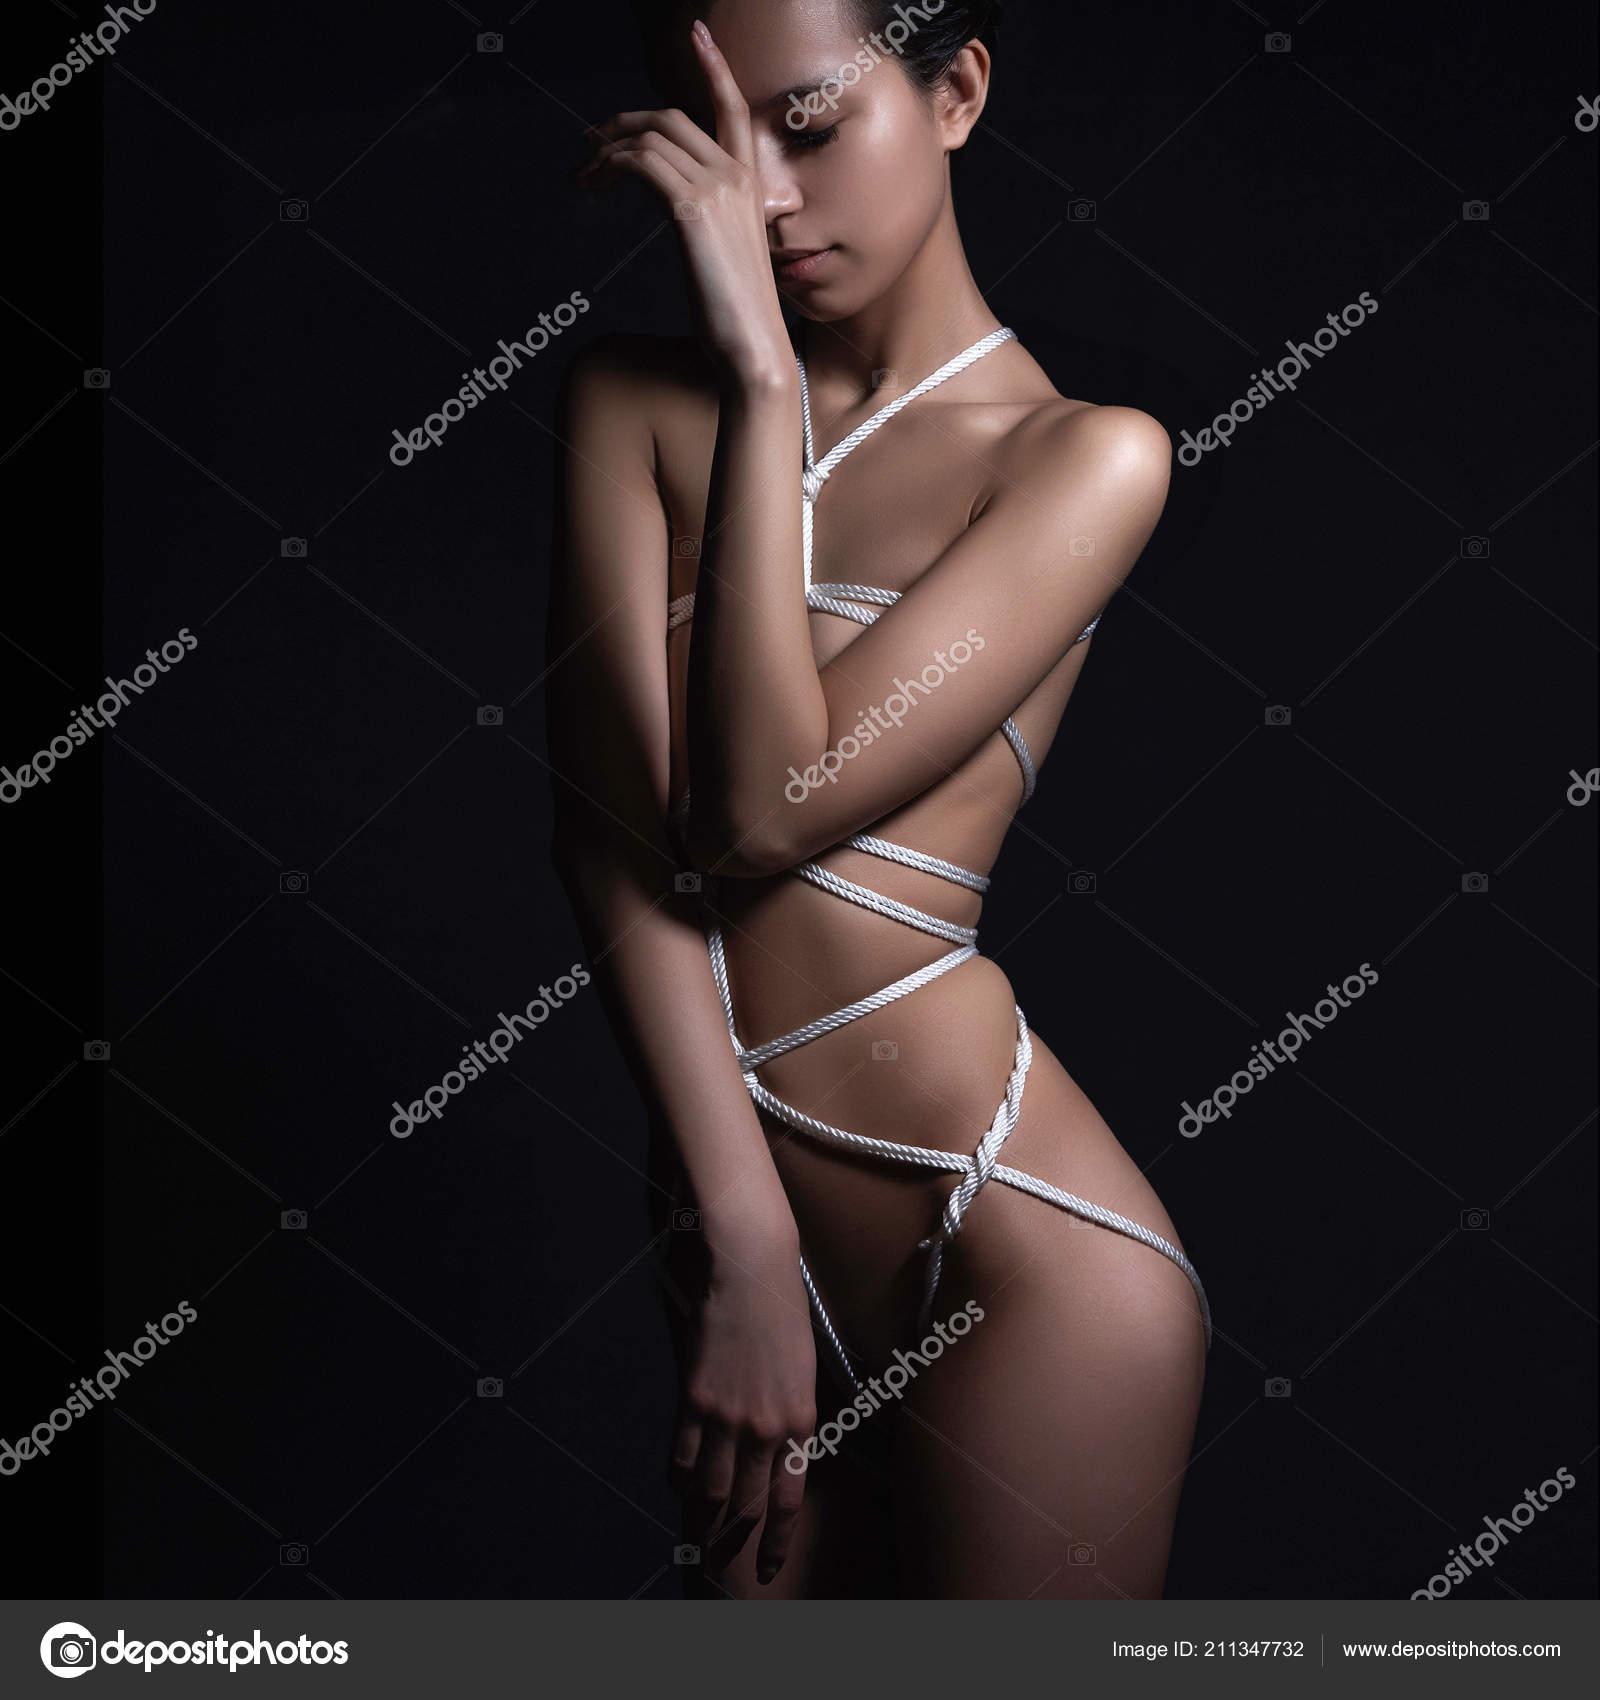 seks-teshey-goloe-krasivoe-gibkoe-telo-foto-marinu-amatorskiy-minet